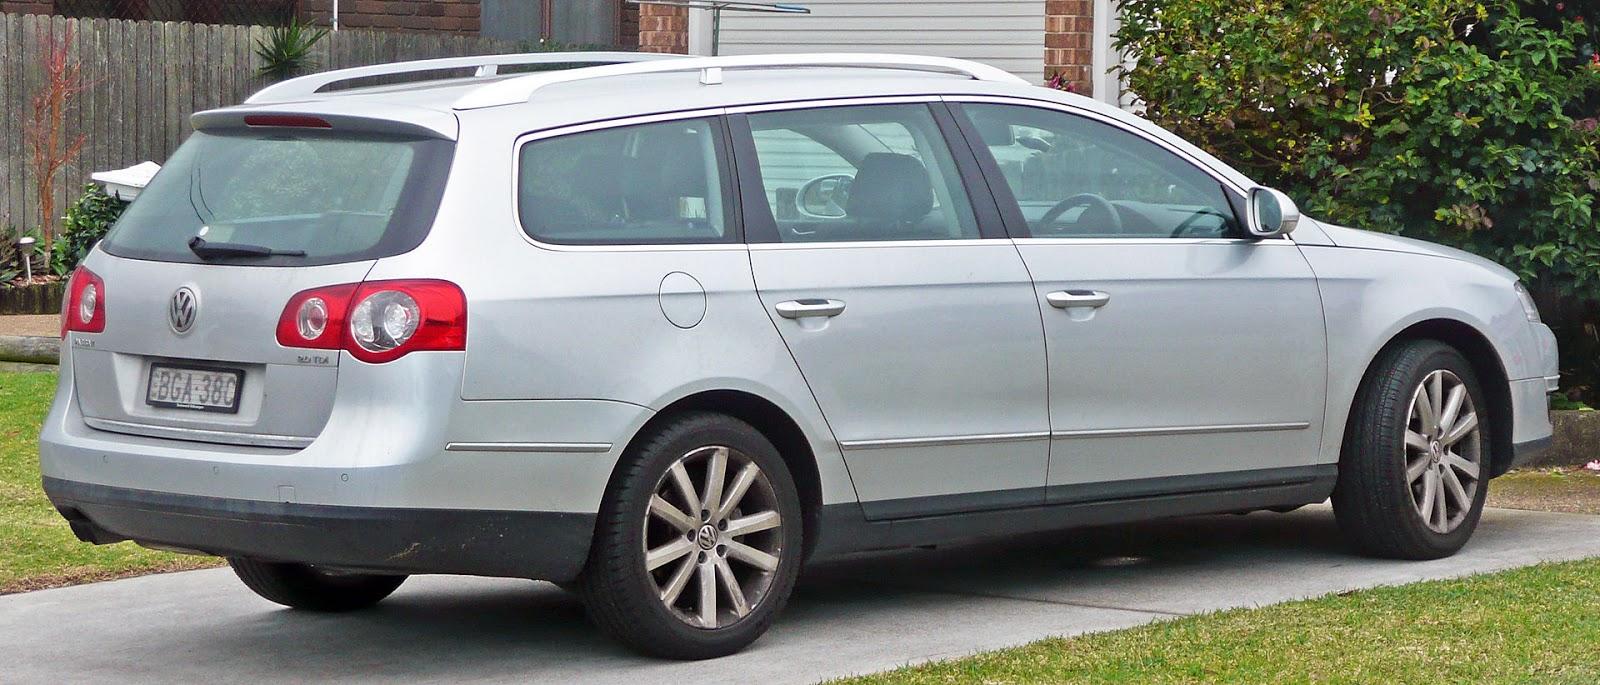 Choose wisely! Volkswagen Passat B6 | Car guy's paradise